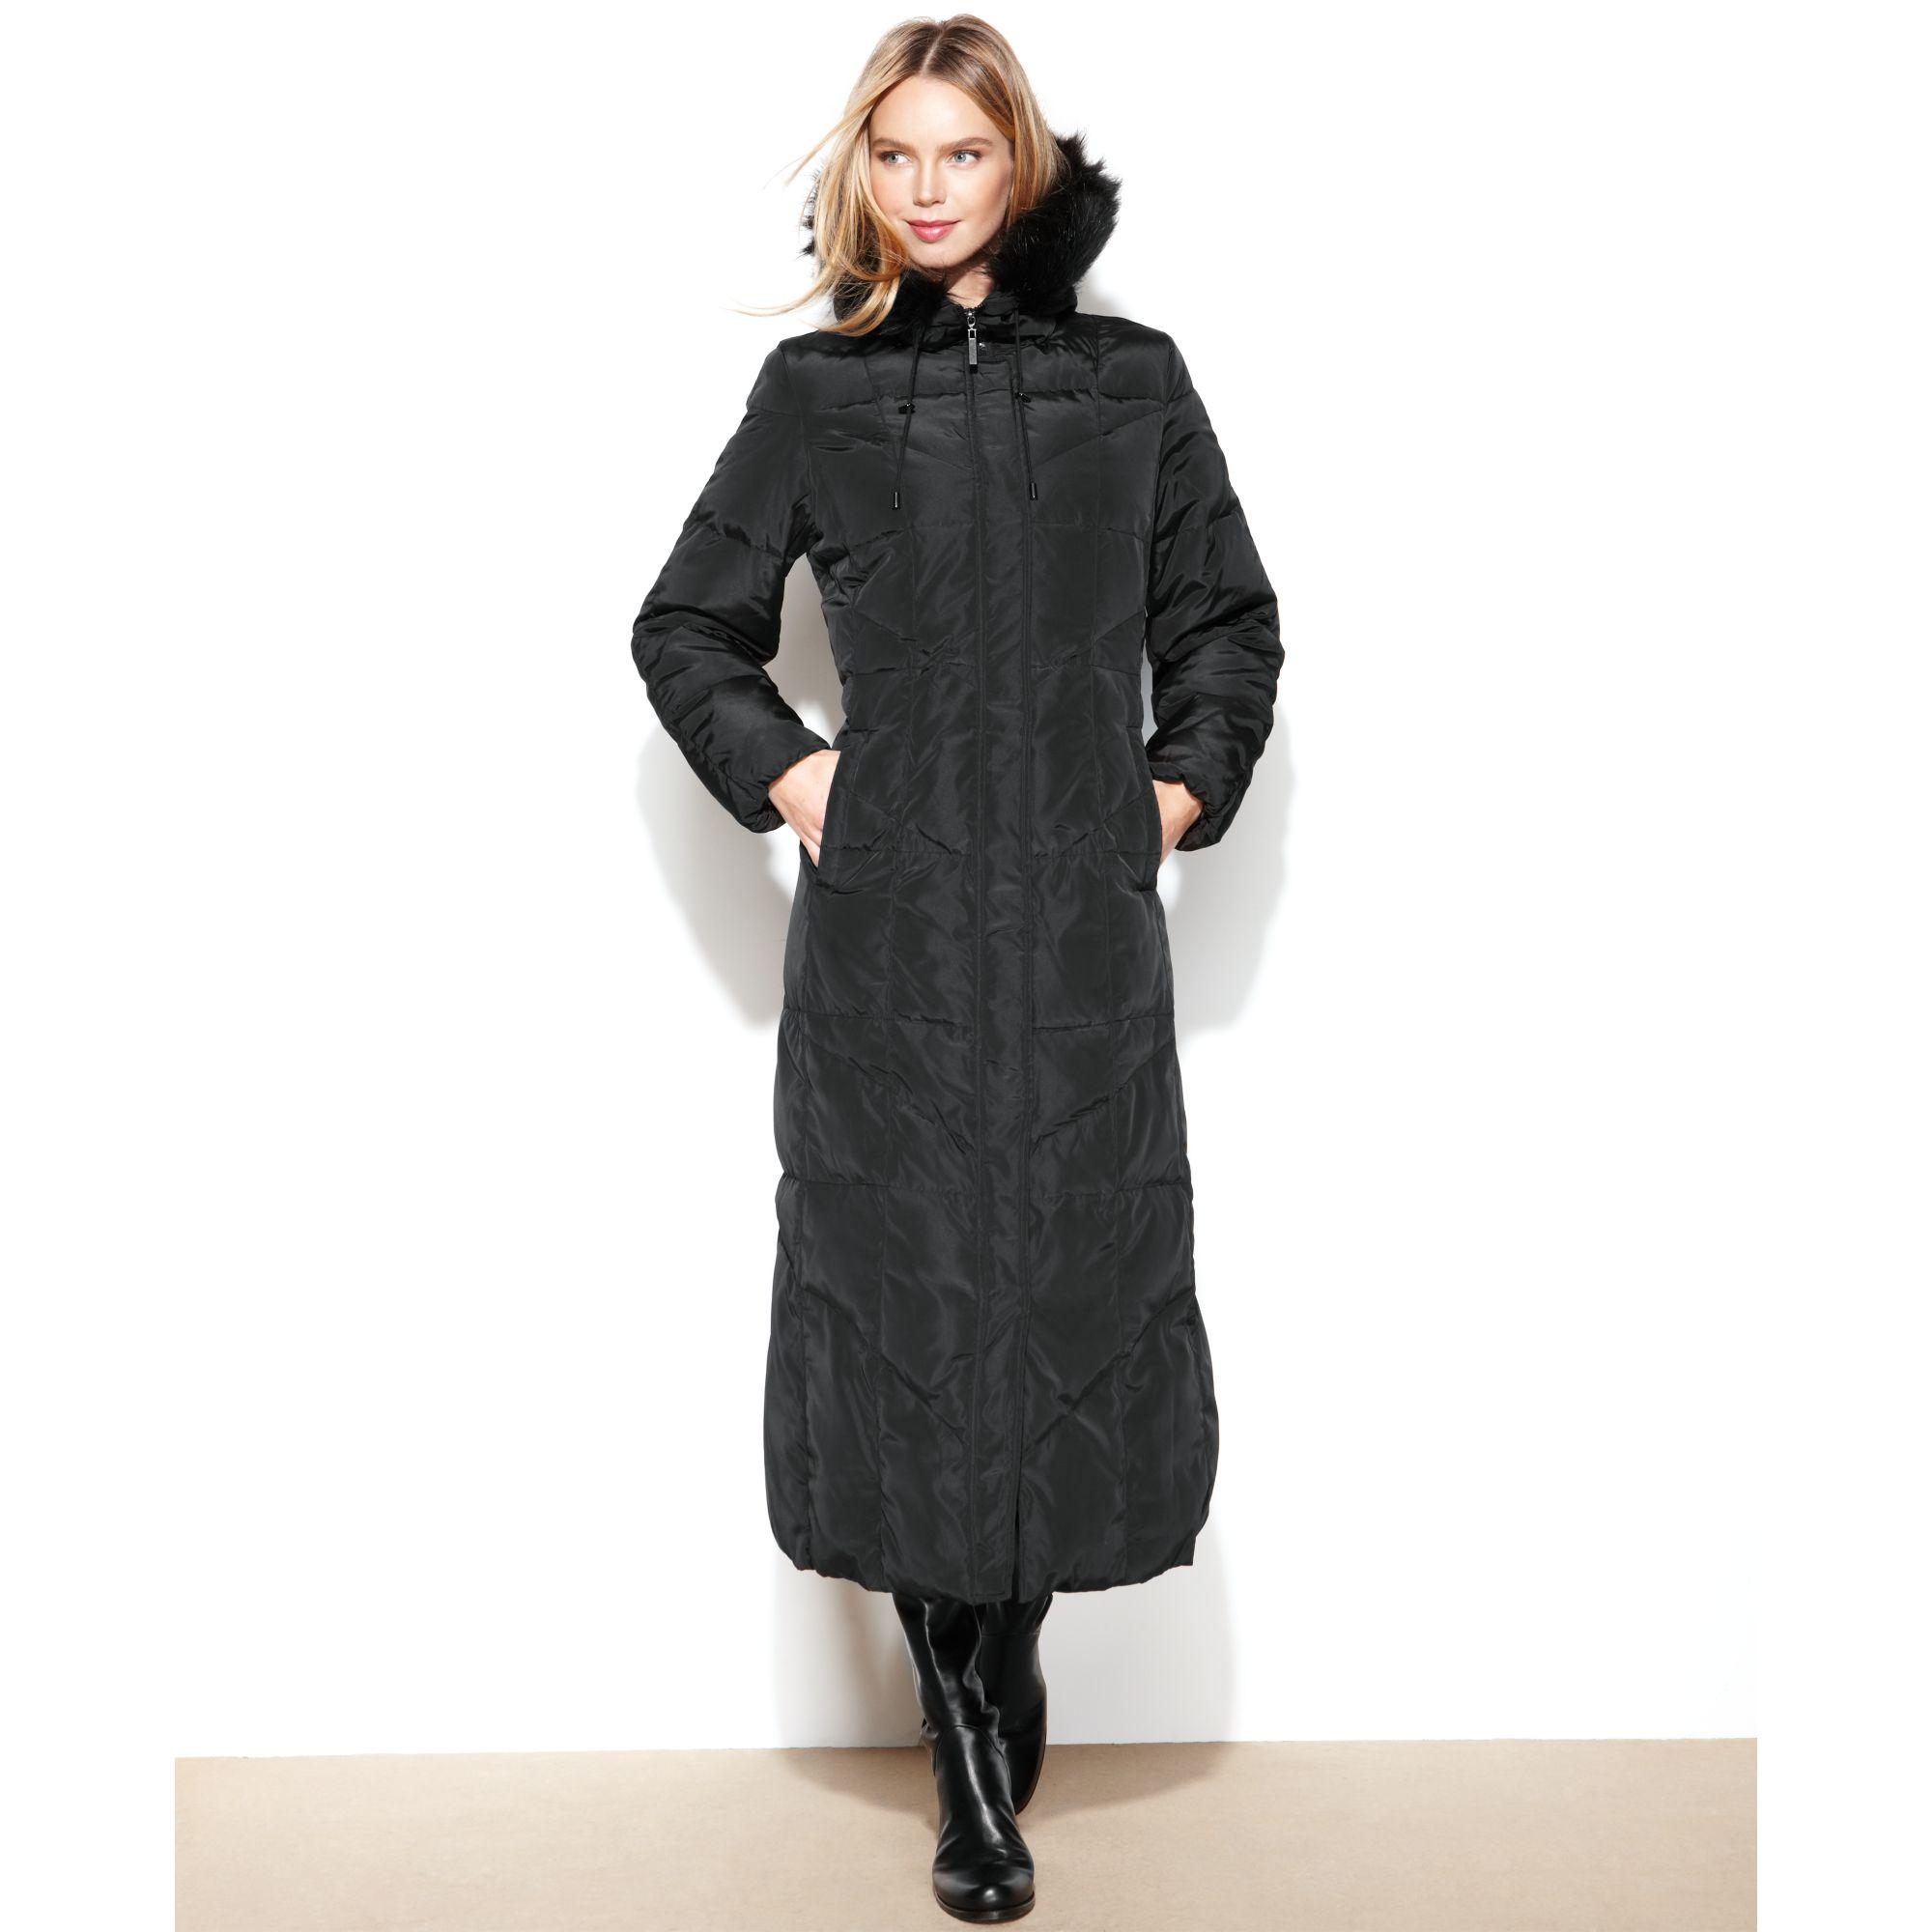 Jones New York Hooded Faux Fur Trim Maxi Puffer In Black